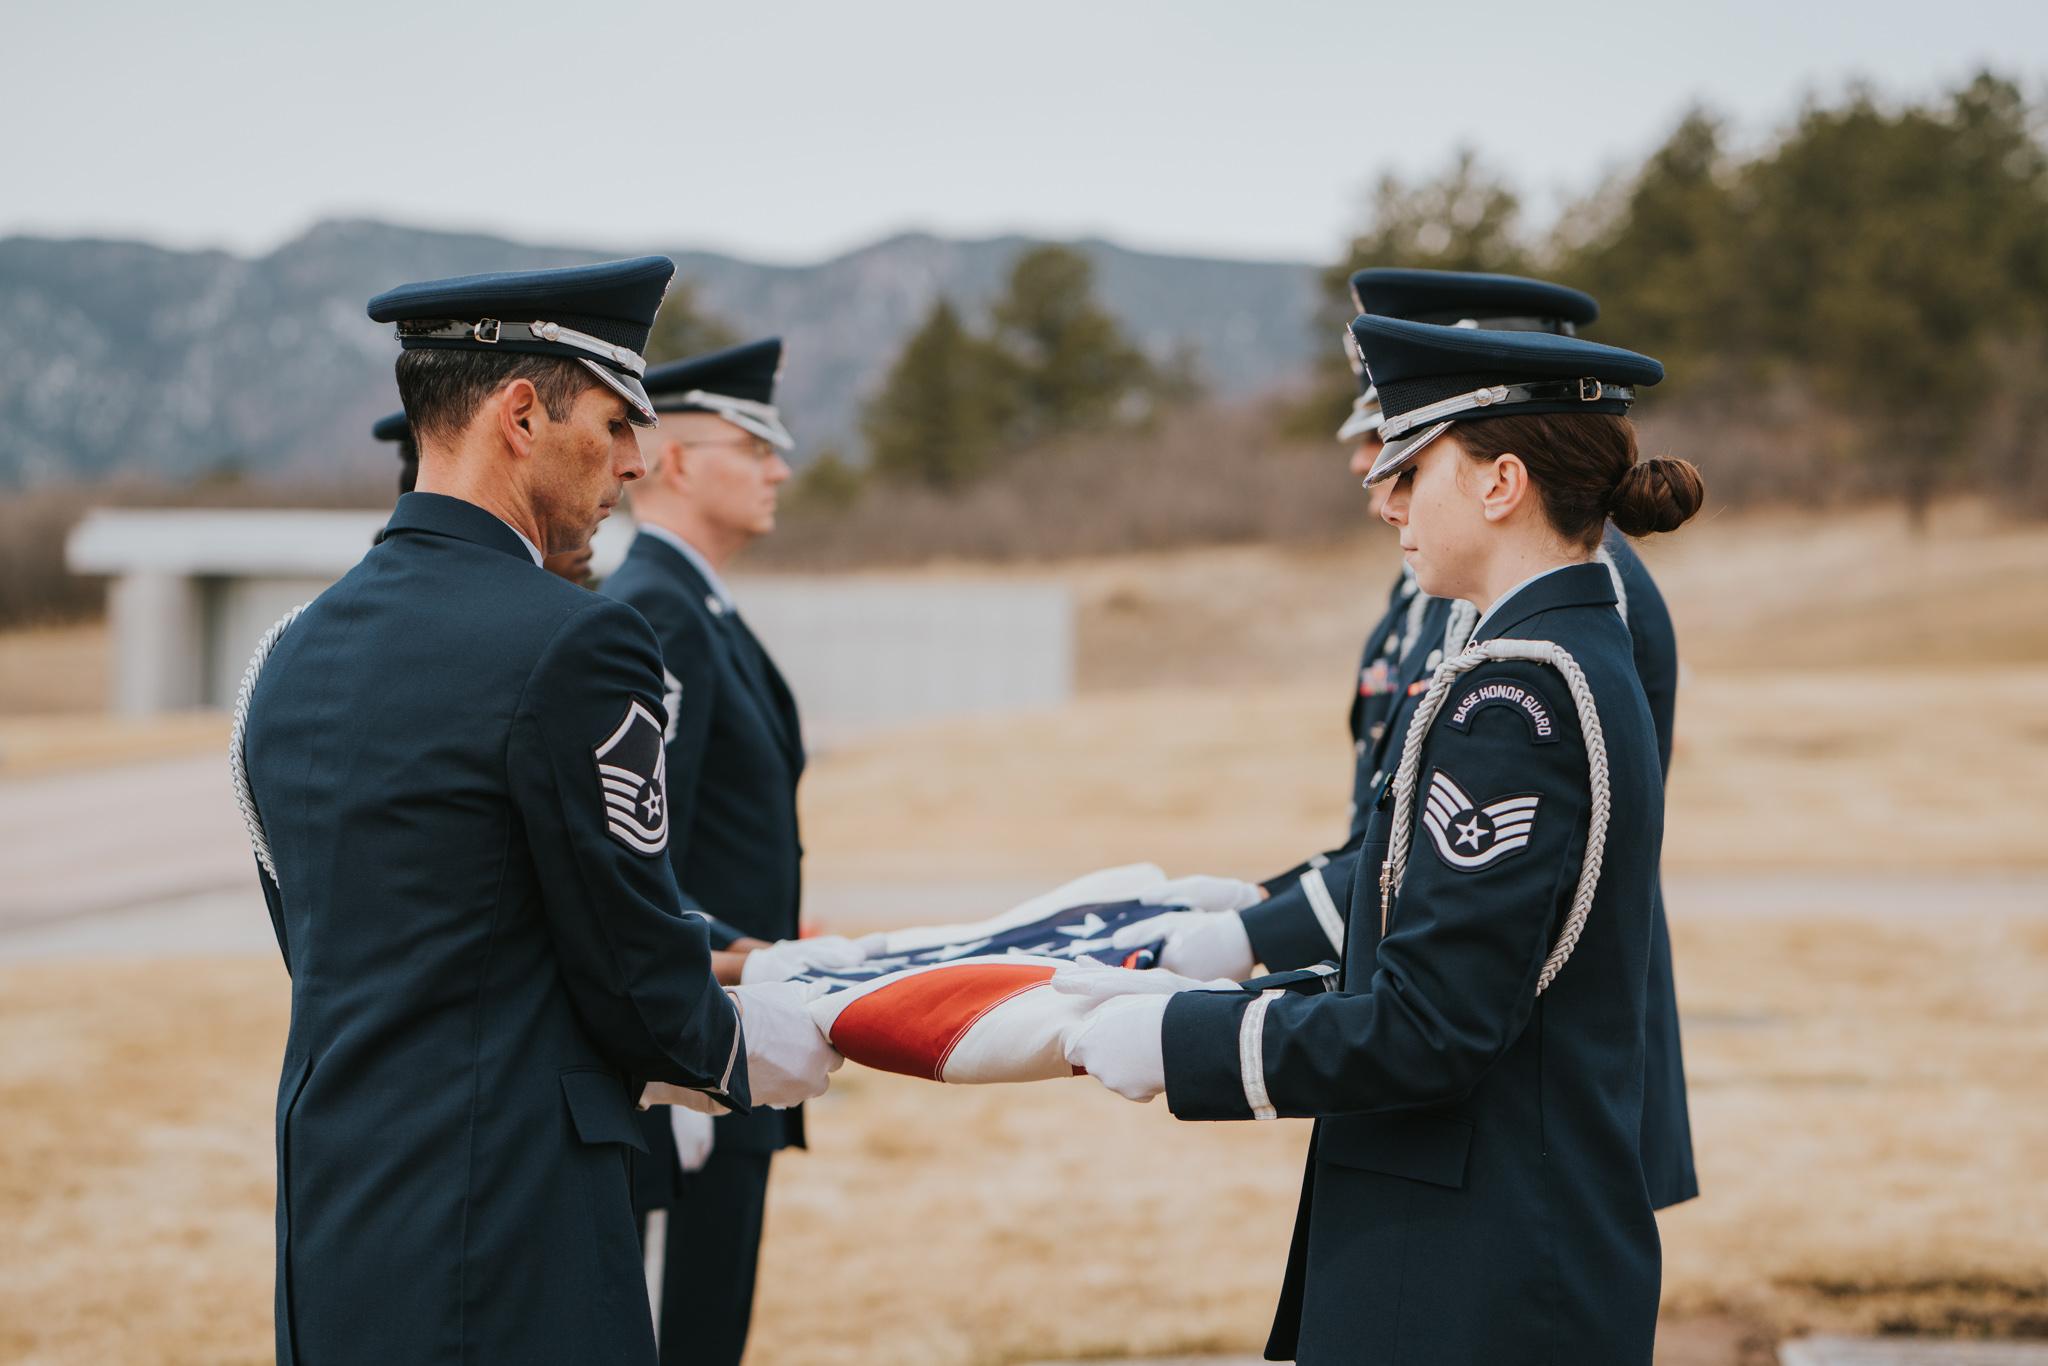 usafa-colorado-military-honours-burial-funeral-photography-grace-elizabeth-colchester-essex-alternative-wedding-lifestyle-photographer (58 of 127).jpg